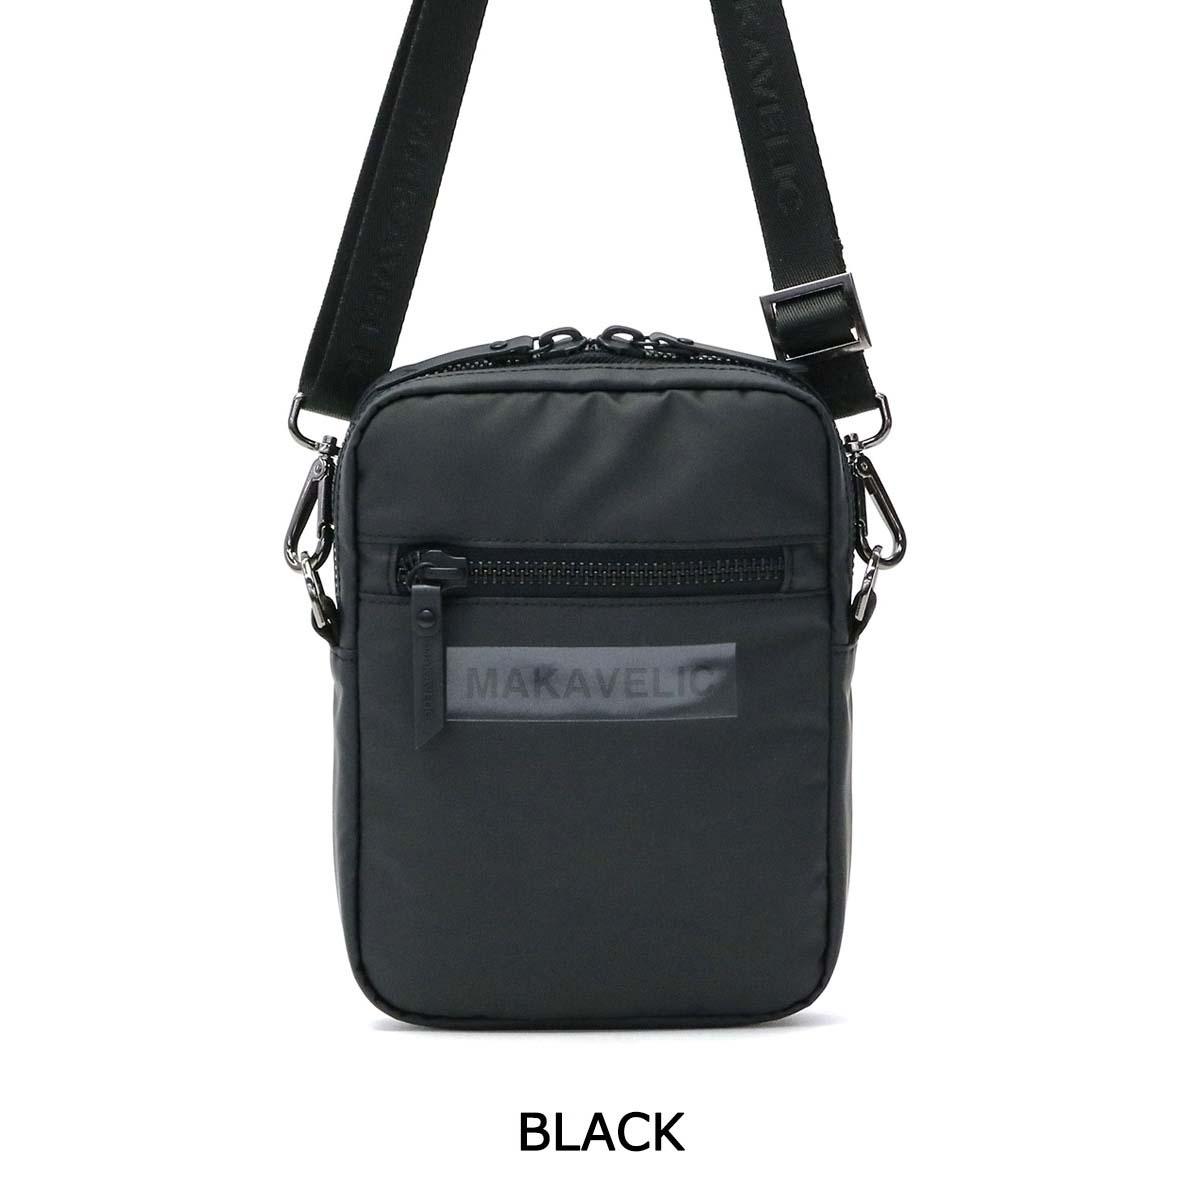 bf0cf000656f MAKAVELIC shoulder bag LUDUS BOX - LOGO POUCH BAG Men  s Women s 3108 -  10503